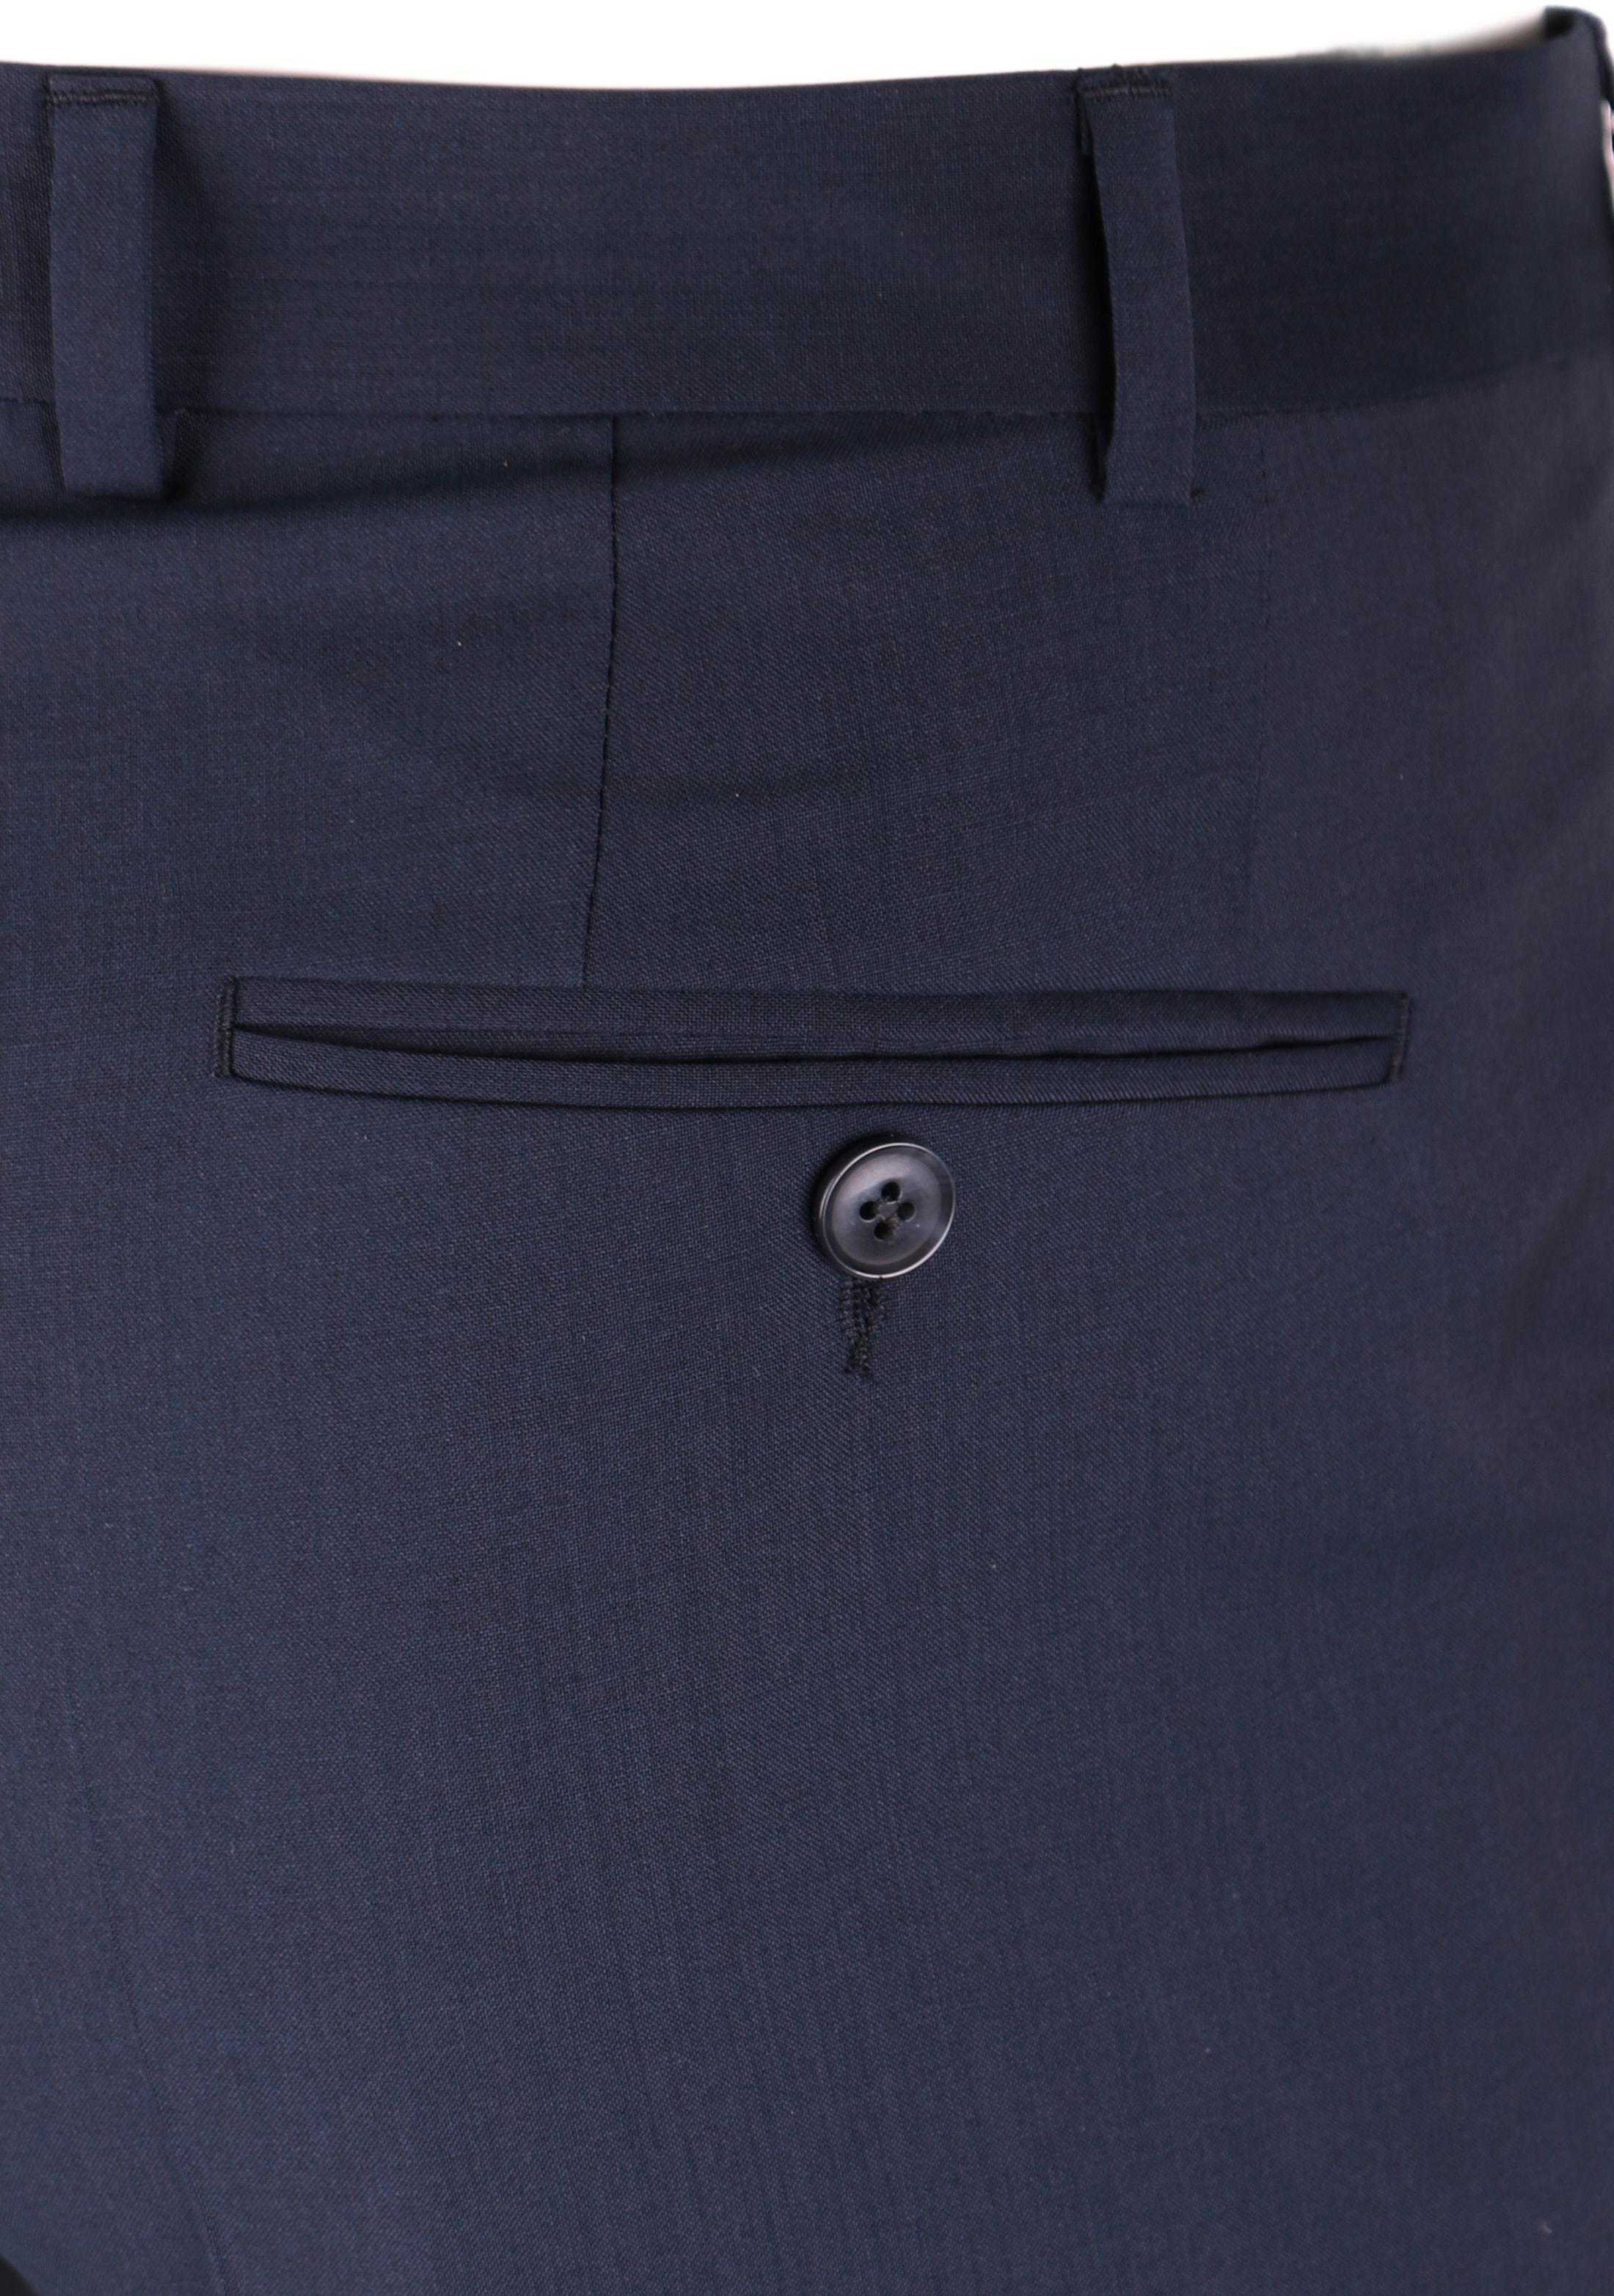 Digel Preference Pantalon Donkerblauw foto 3